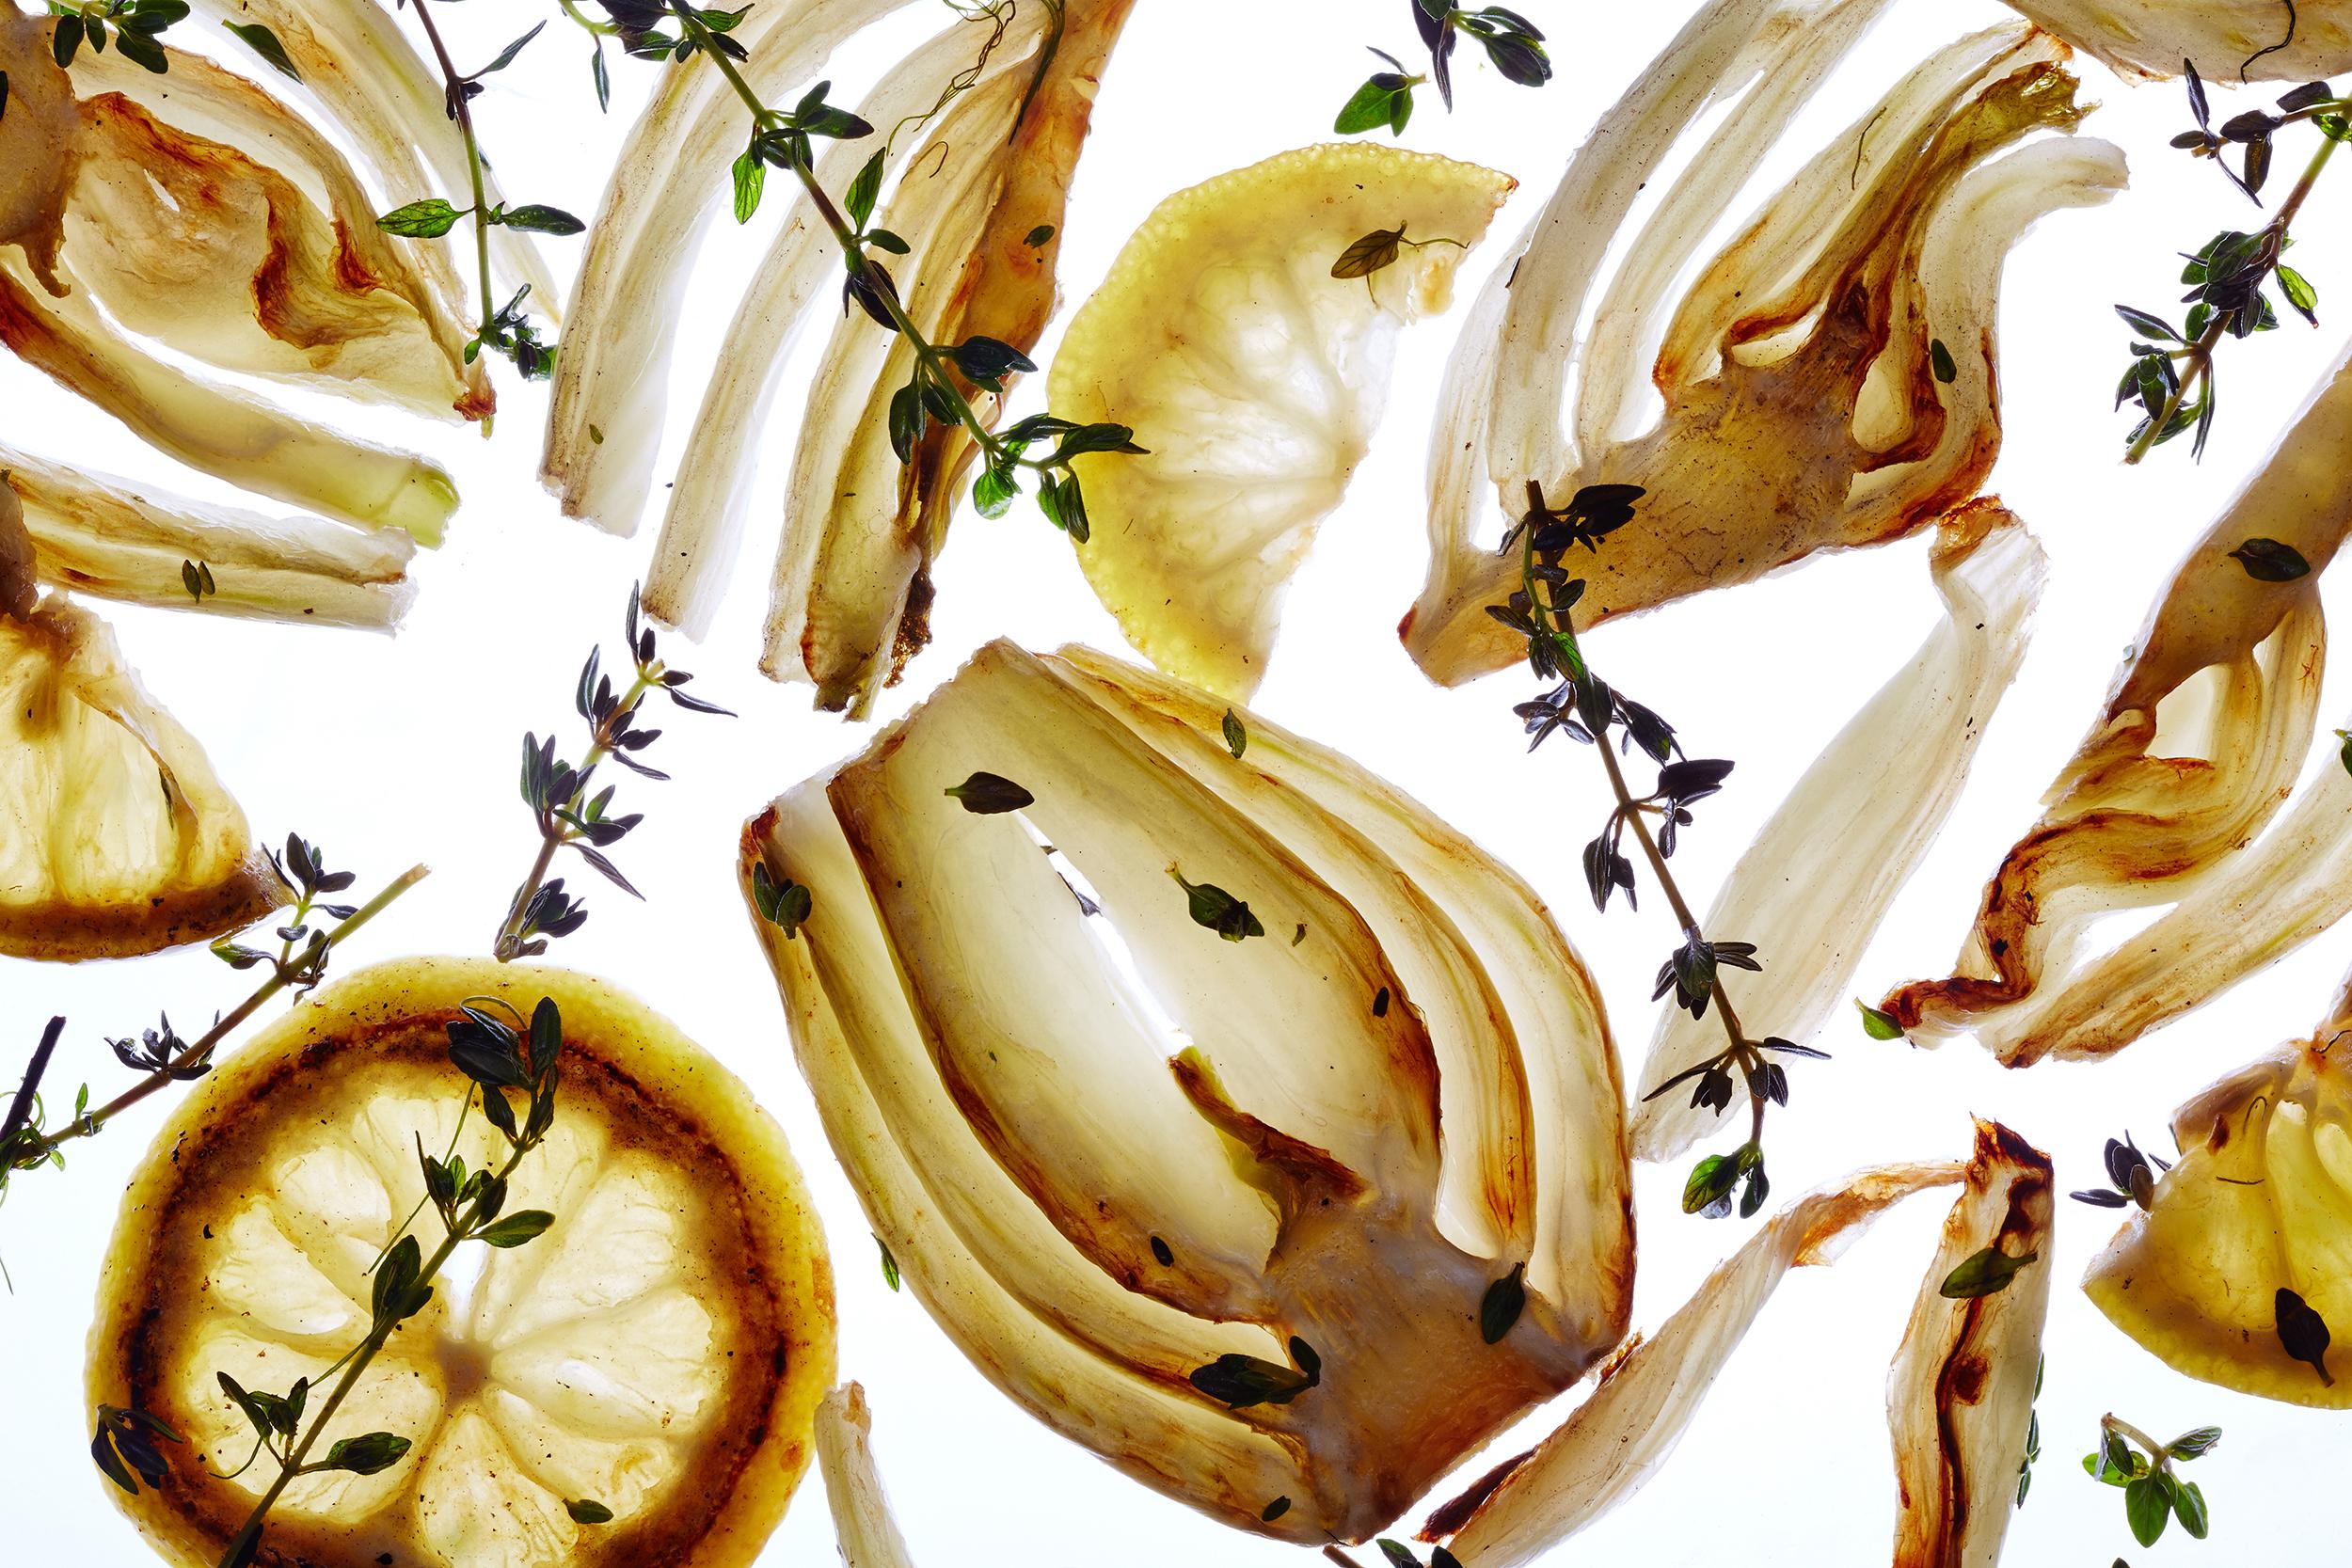 Translucent Fennel, Thyme, and Lemon